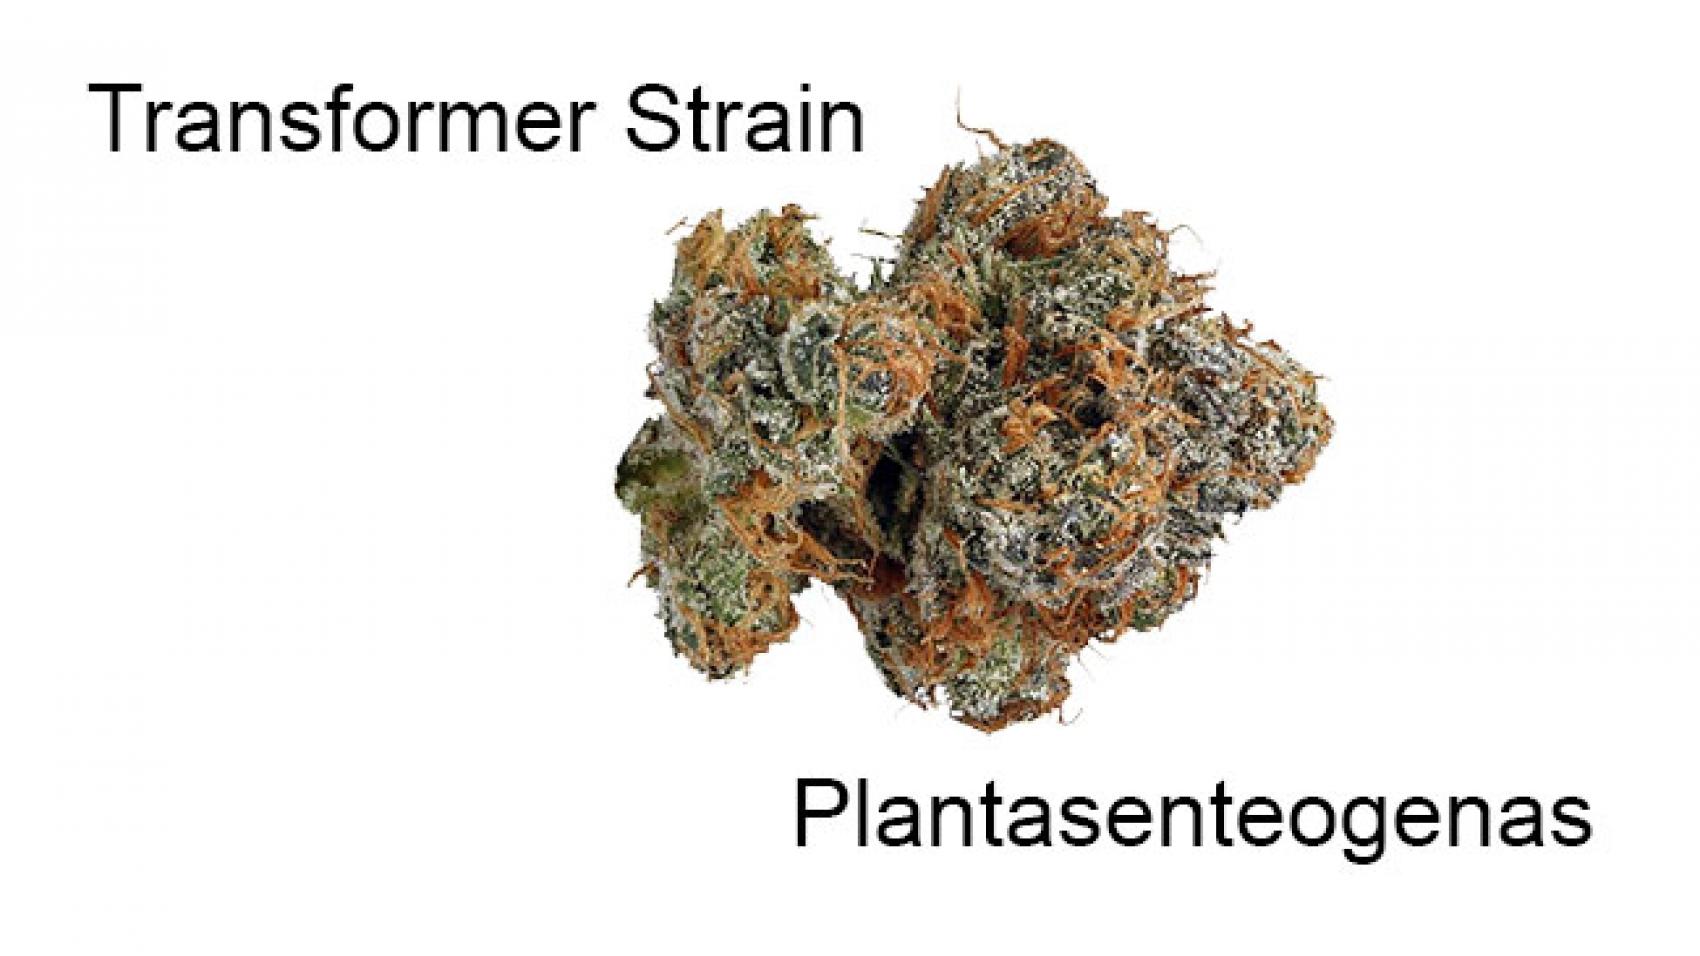 Transformer Strain